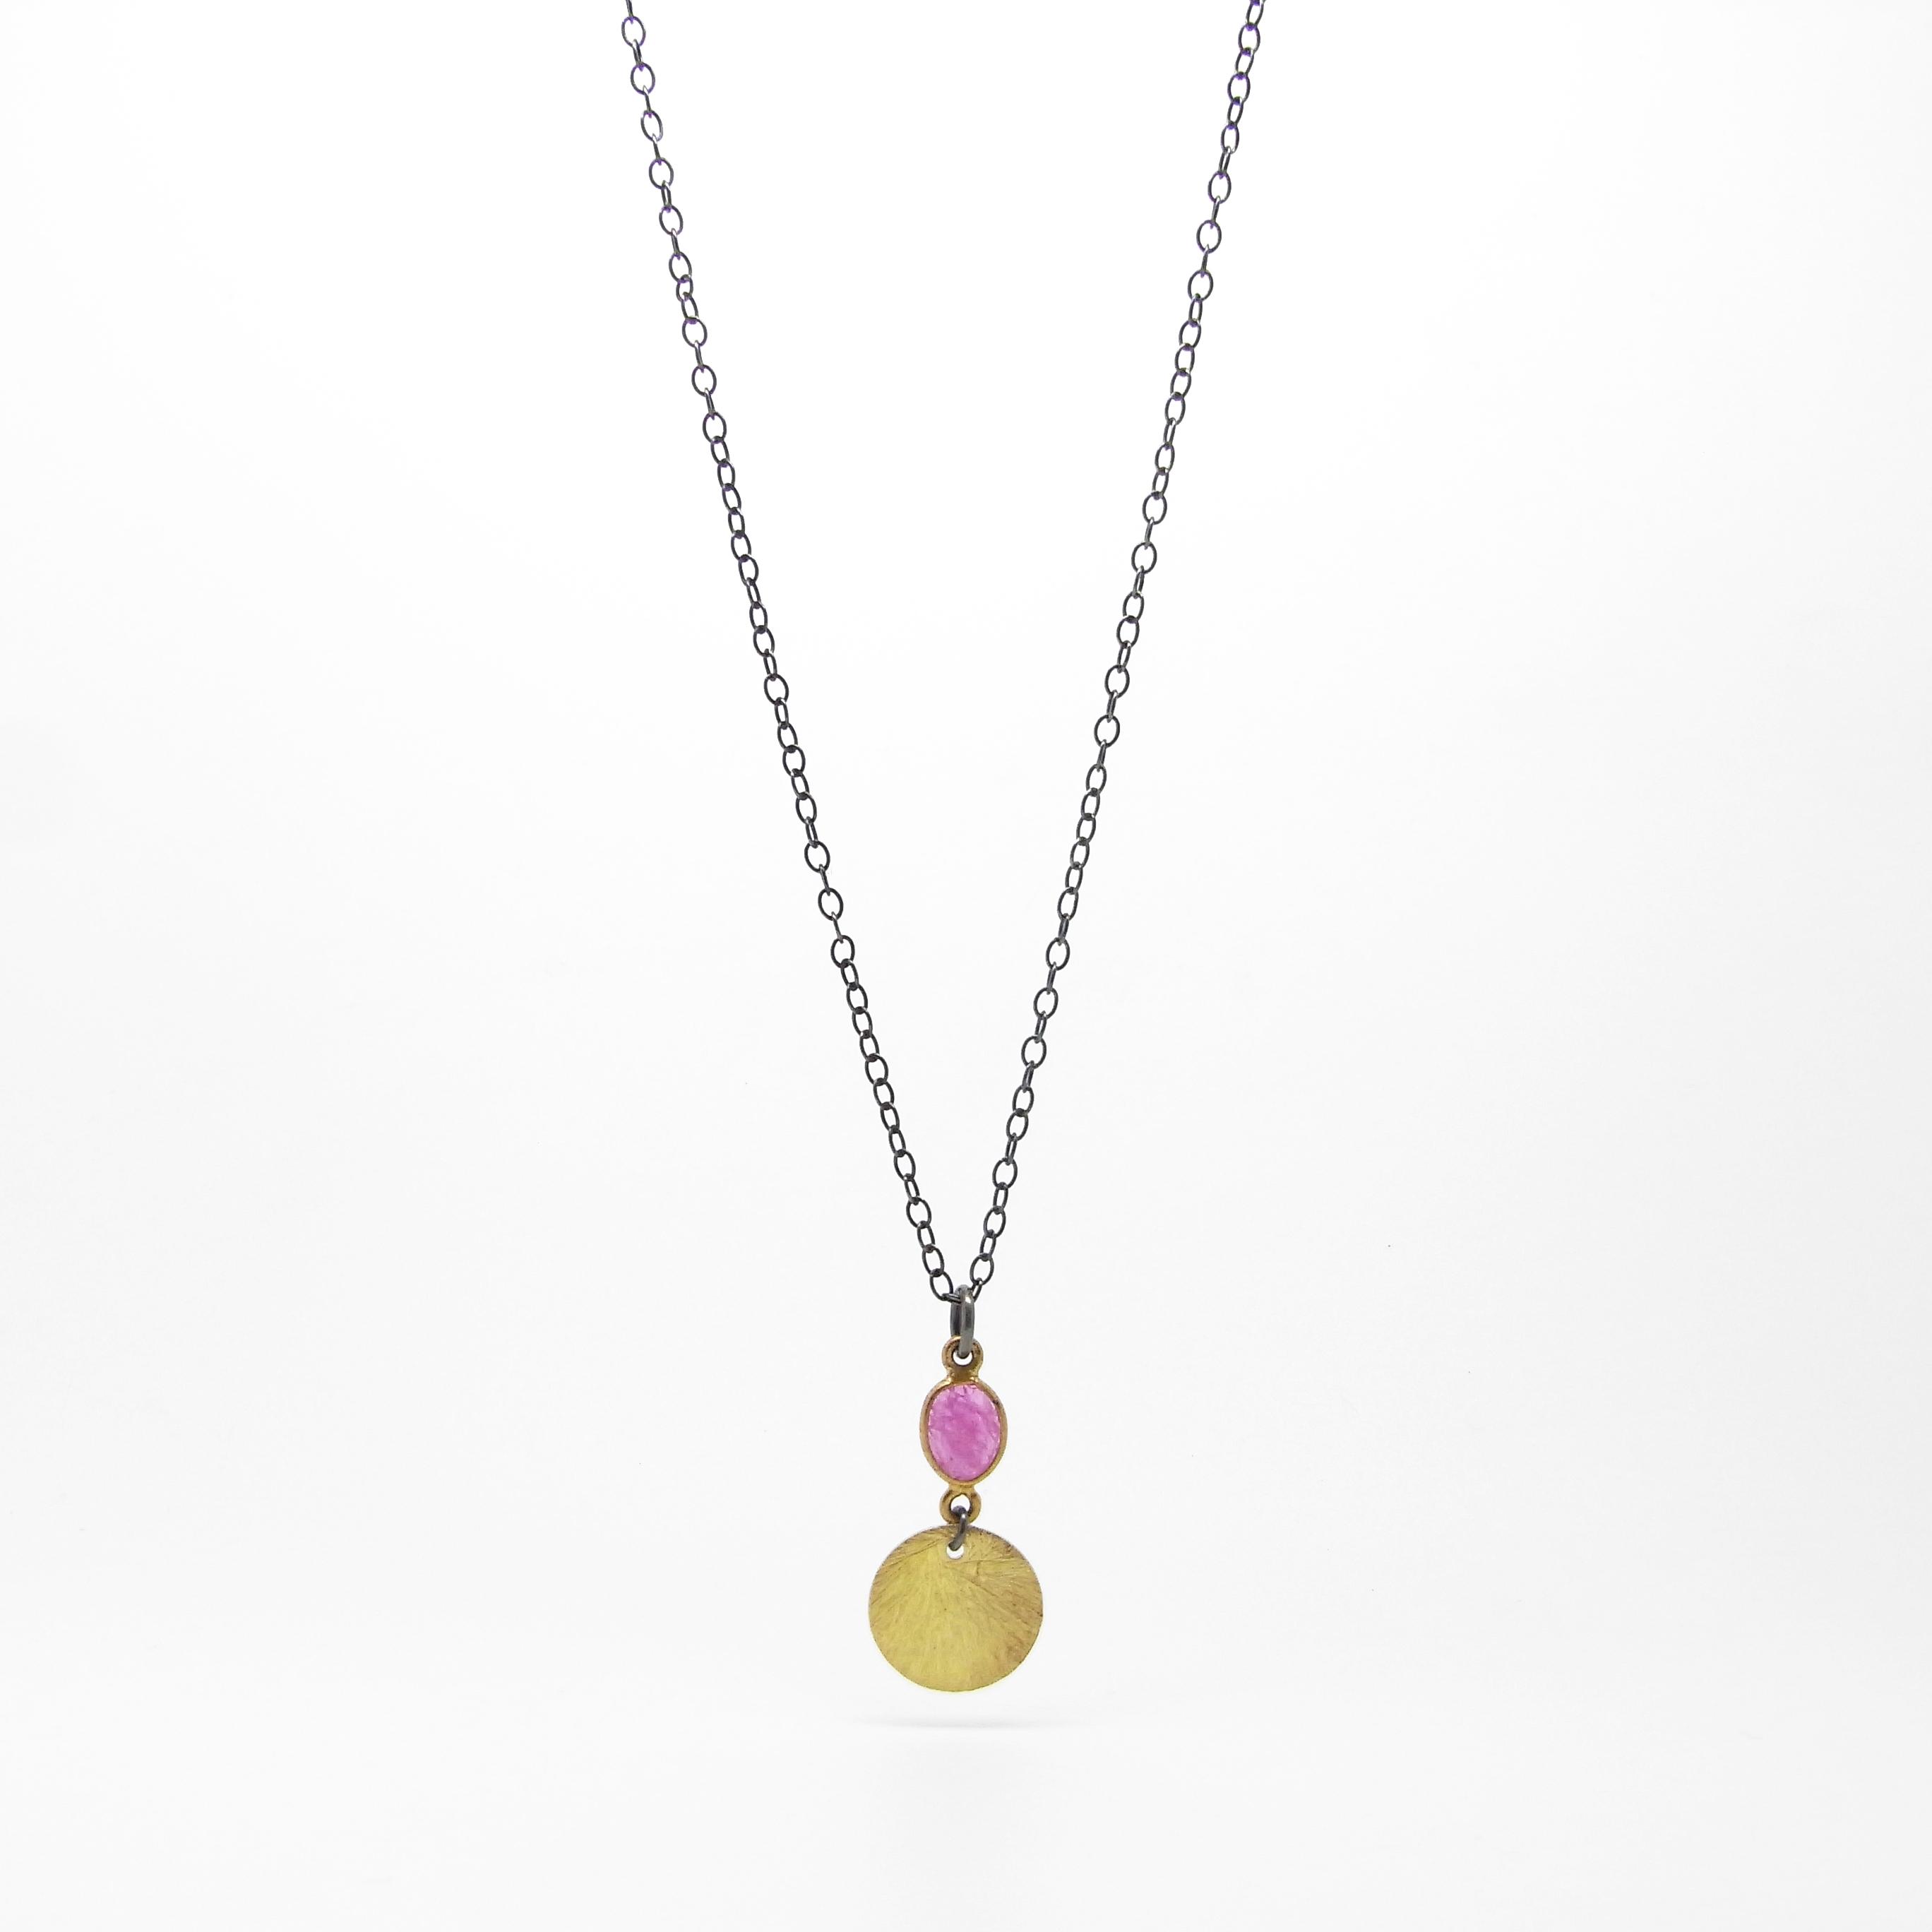 SALE - Long Pink Tourmaline Necklace